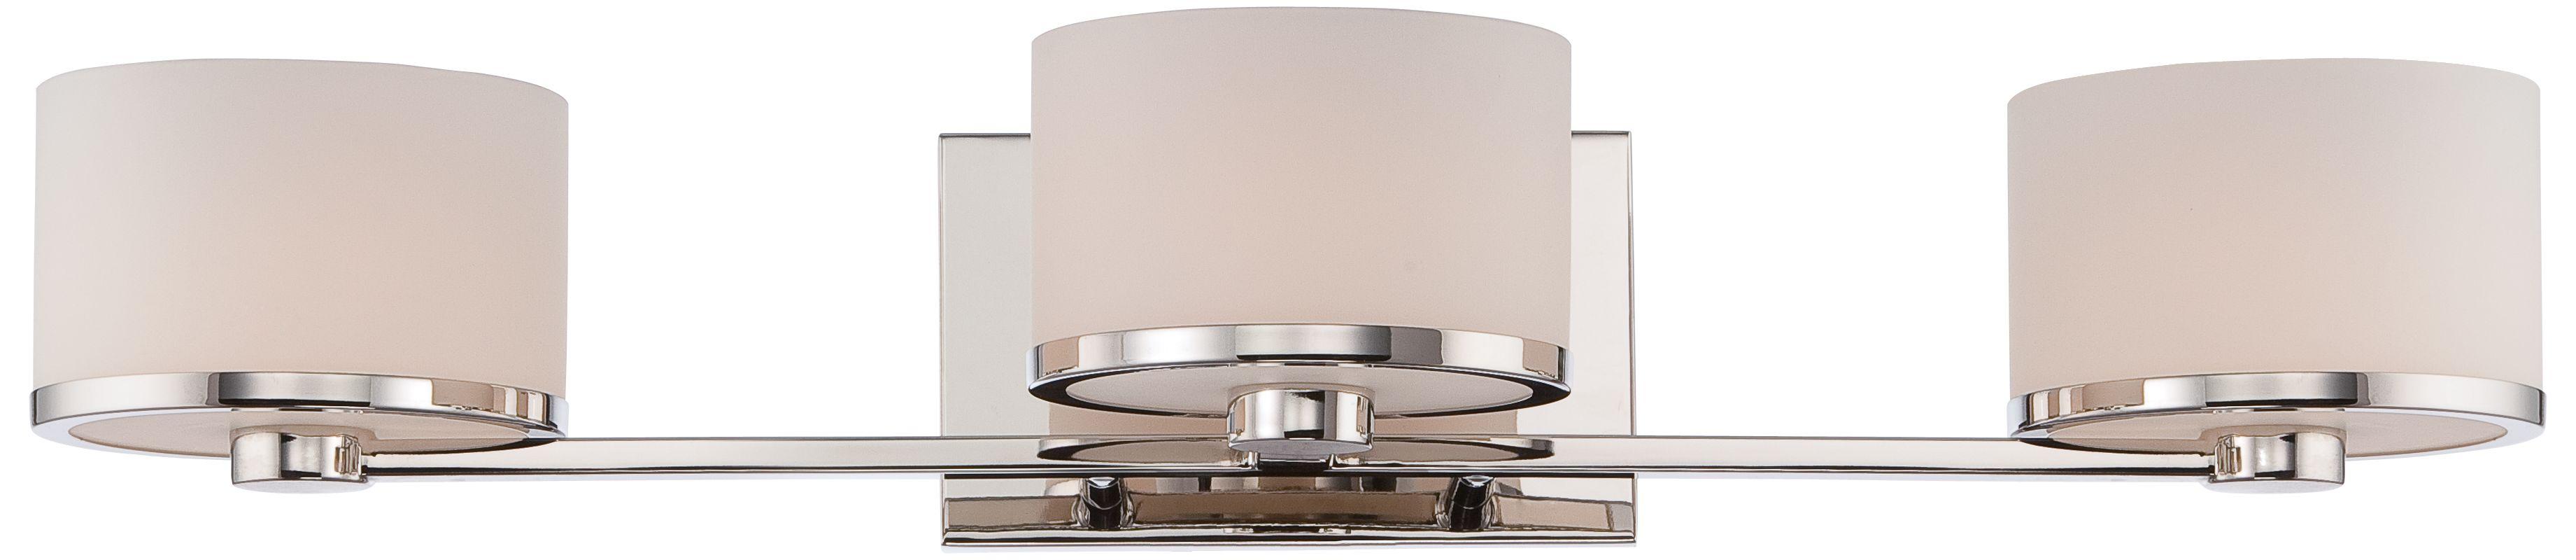 Nuvo Lighting 60/5473 Celine 3 Light Bathroom Vanity Light in Polished